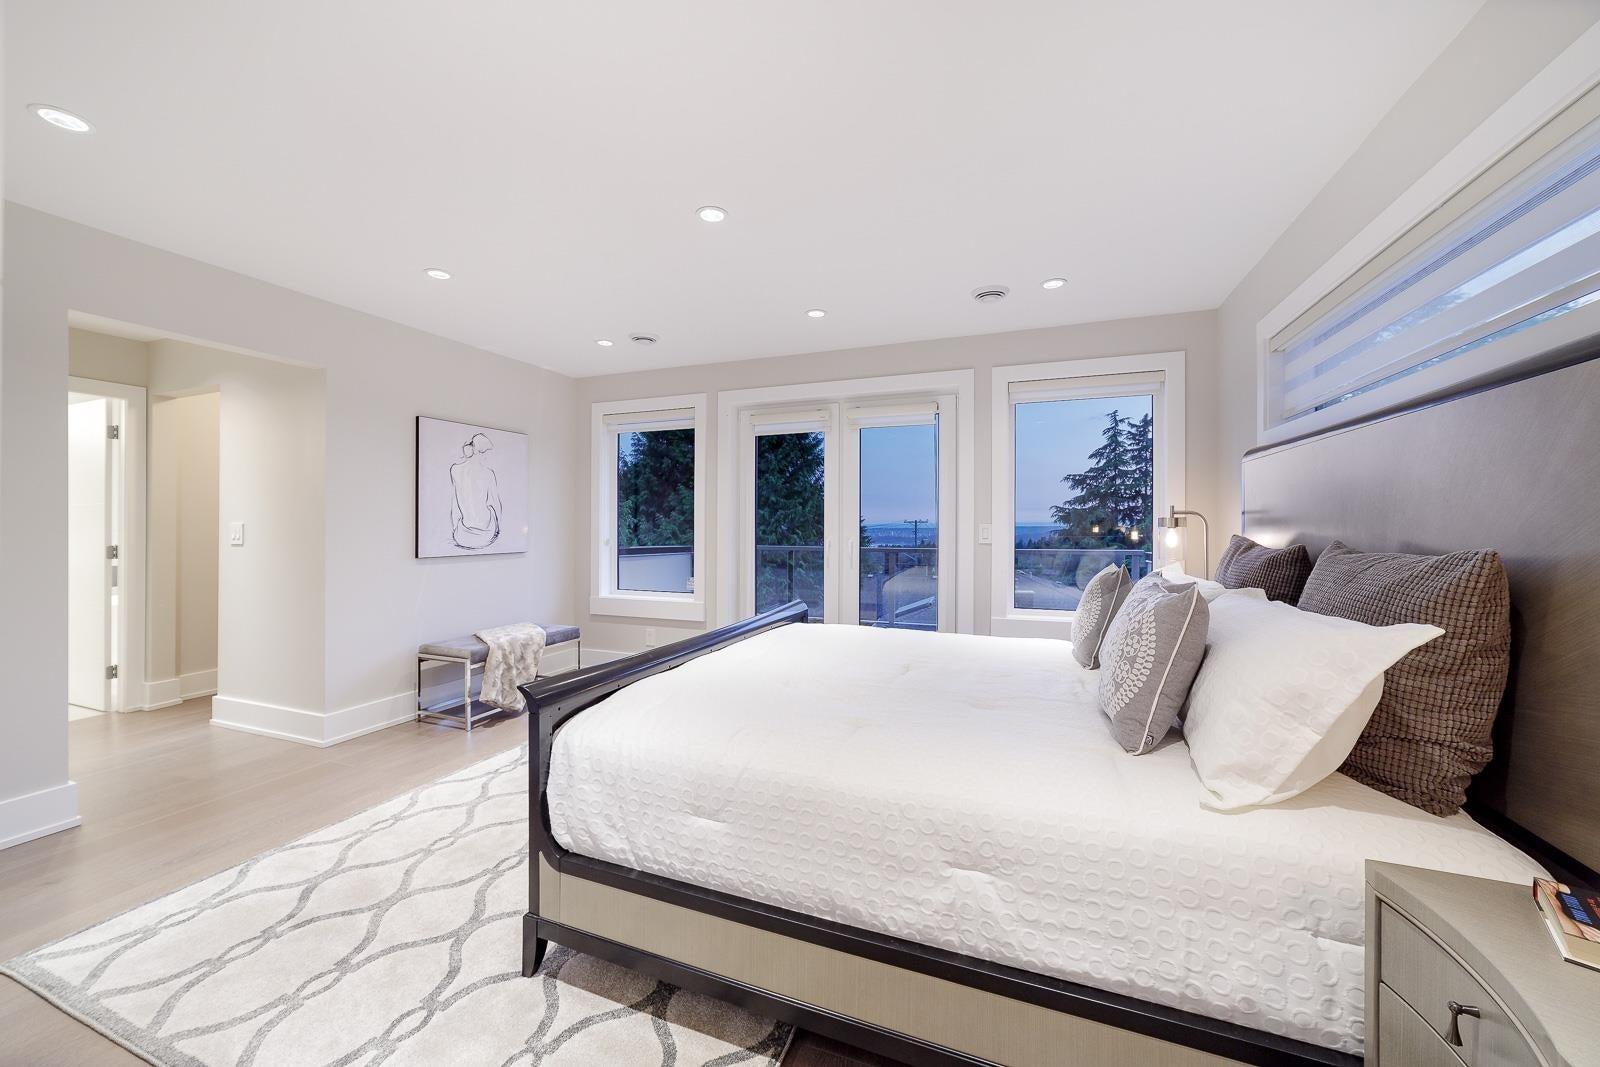 517 GRANADA CRESCENT - Upper Delbrook House/Single Family for sale, 8 Bedrooms (R2615057) - #16